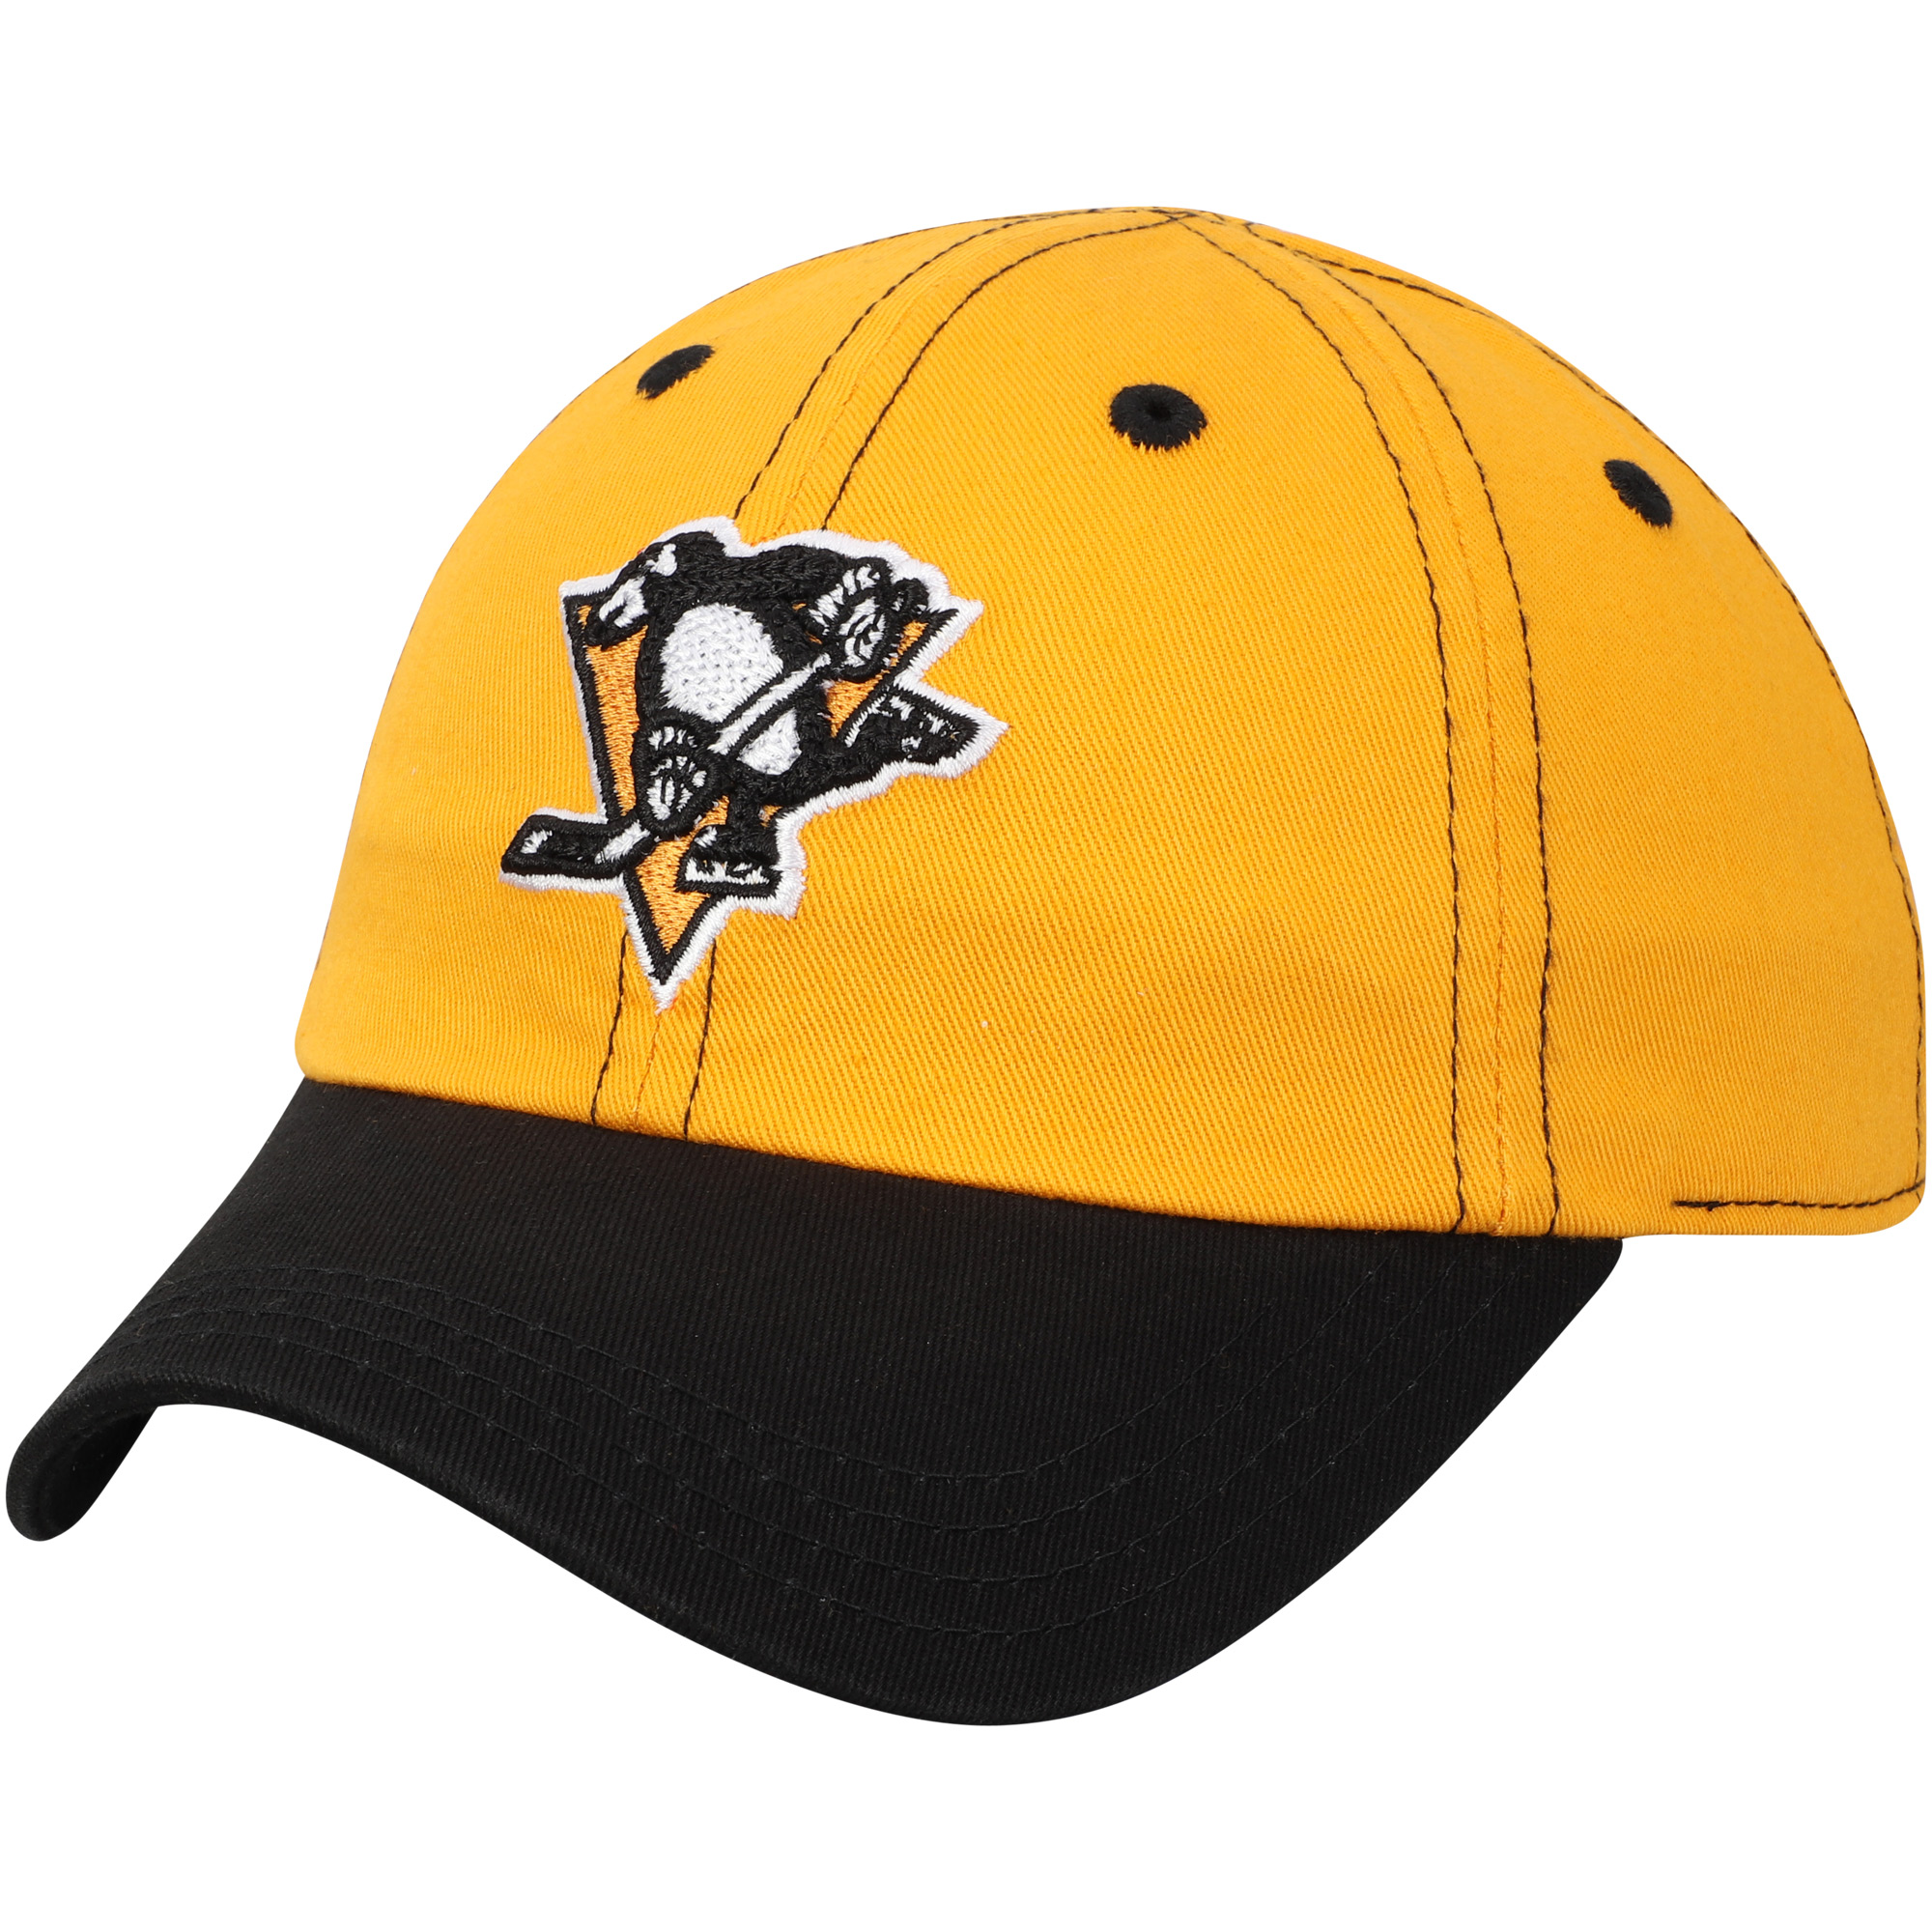 Pittsburgh Penguins Infant Chainstitch Slouch Adjustable Hat - Gold/Black - OSFA